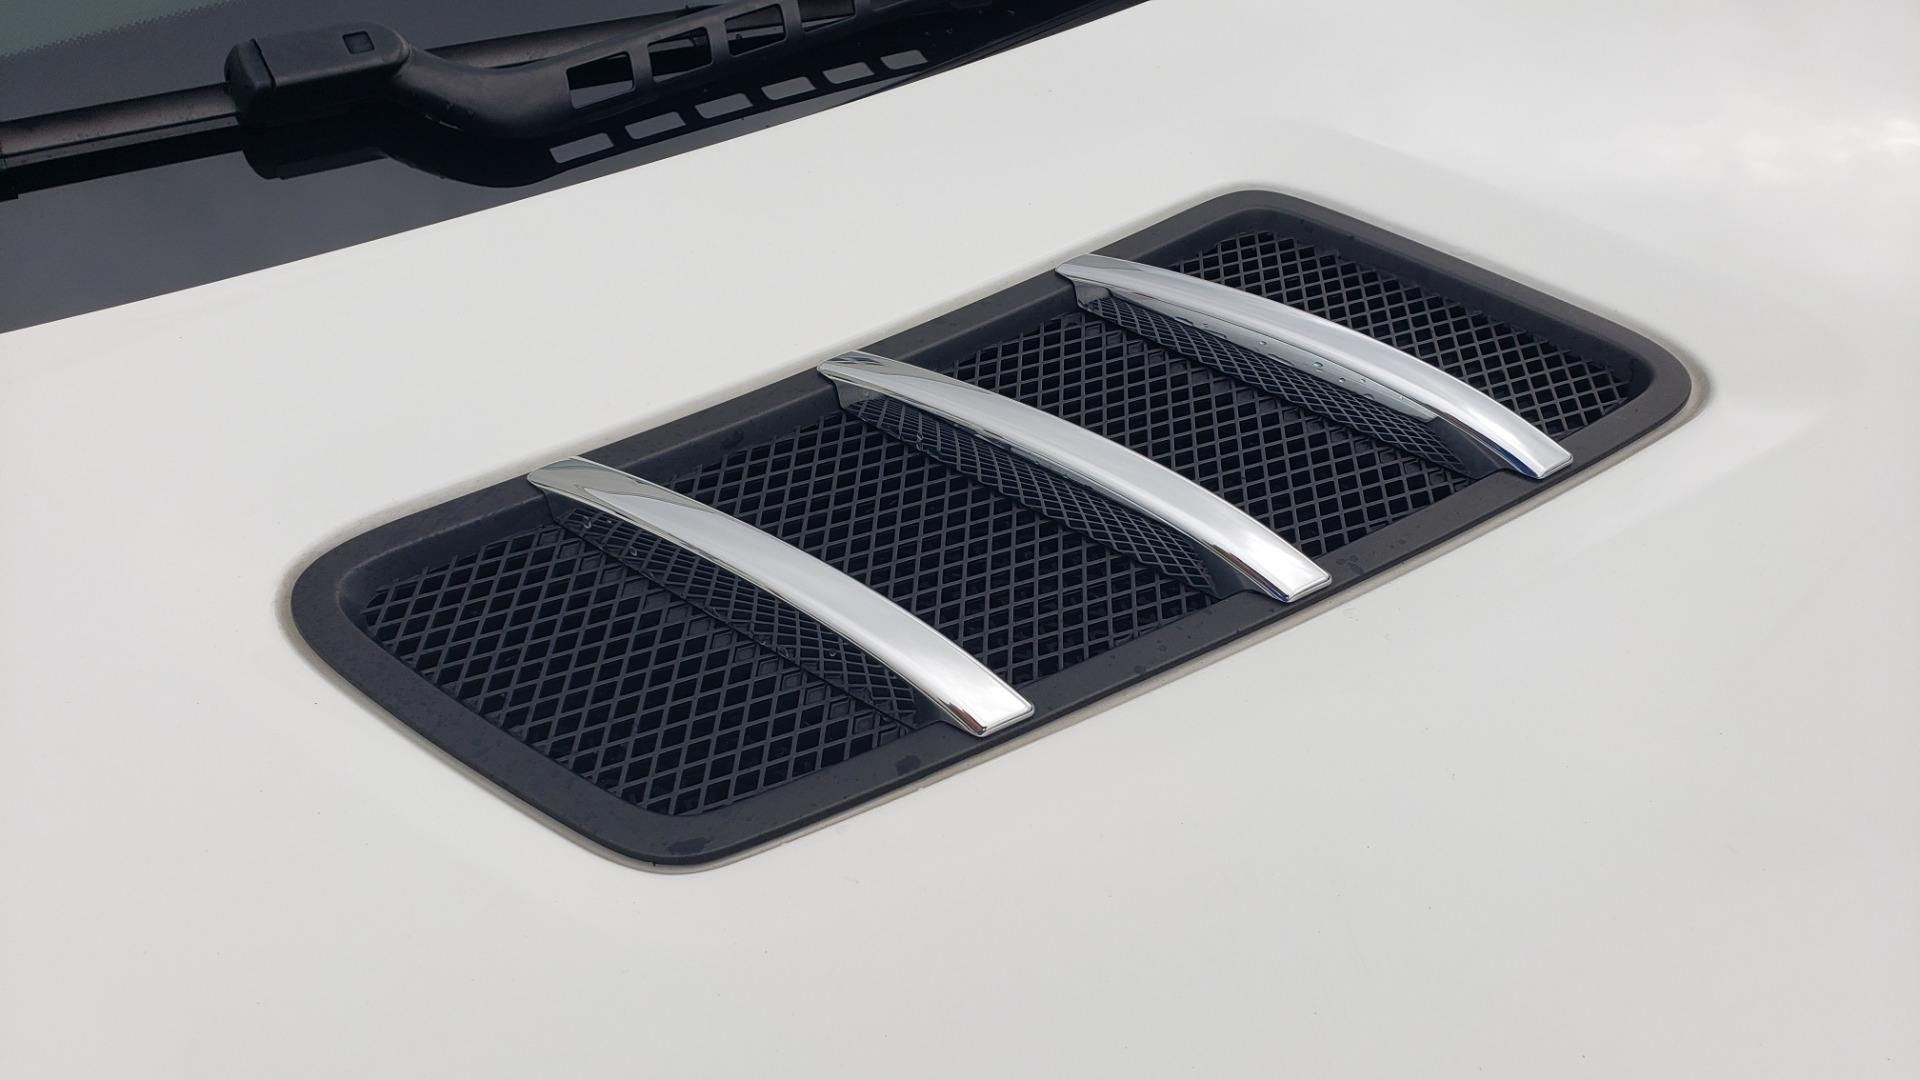 Used 2018 Mercedes-Benz GLE 350 4MATIC / PREM PKG / NAV / PARK ASST / K/H SND / HITCH / REARVIEW for sale $40,801 at Formula Imports in Charlotte NC 28227 28